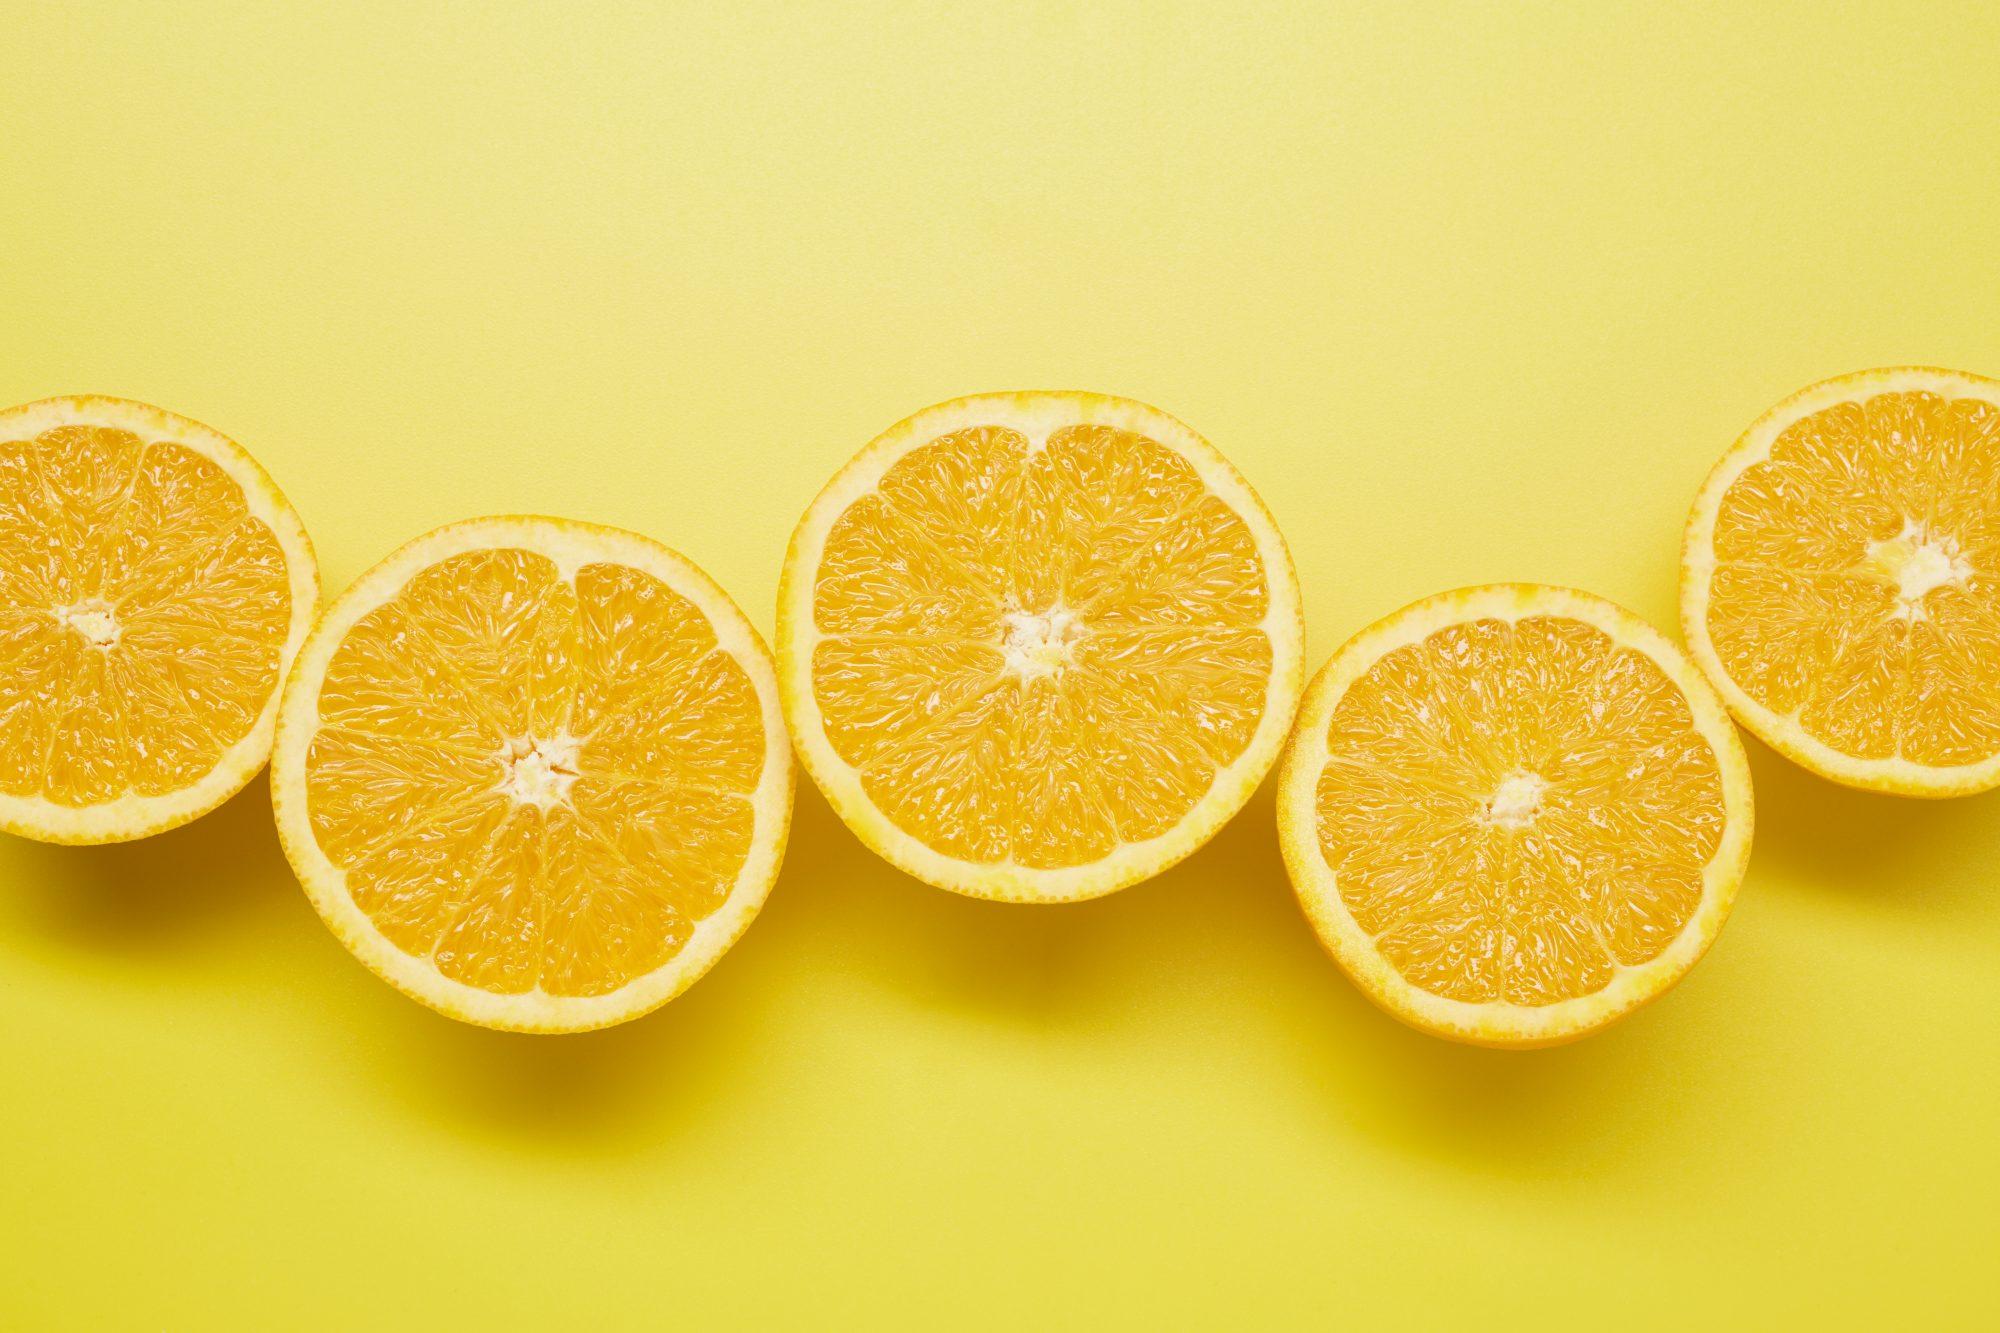 Oranges Getty 3/13/20